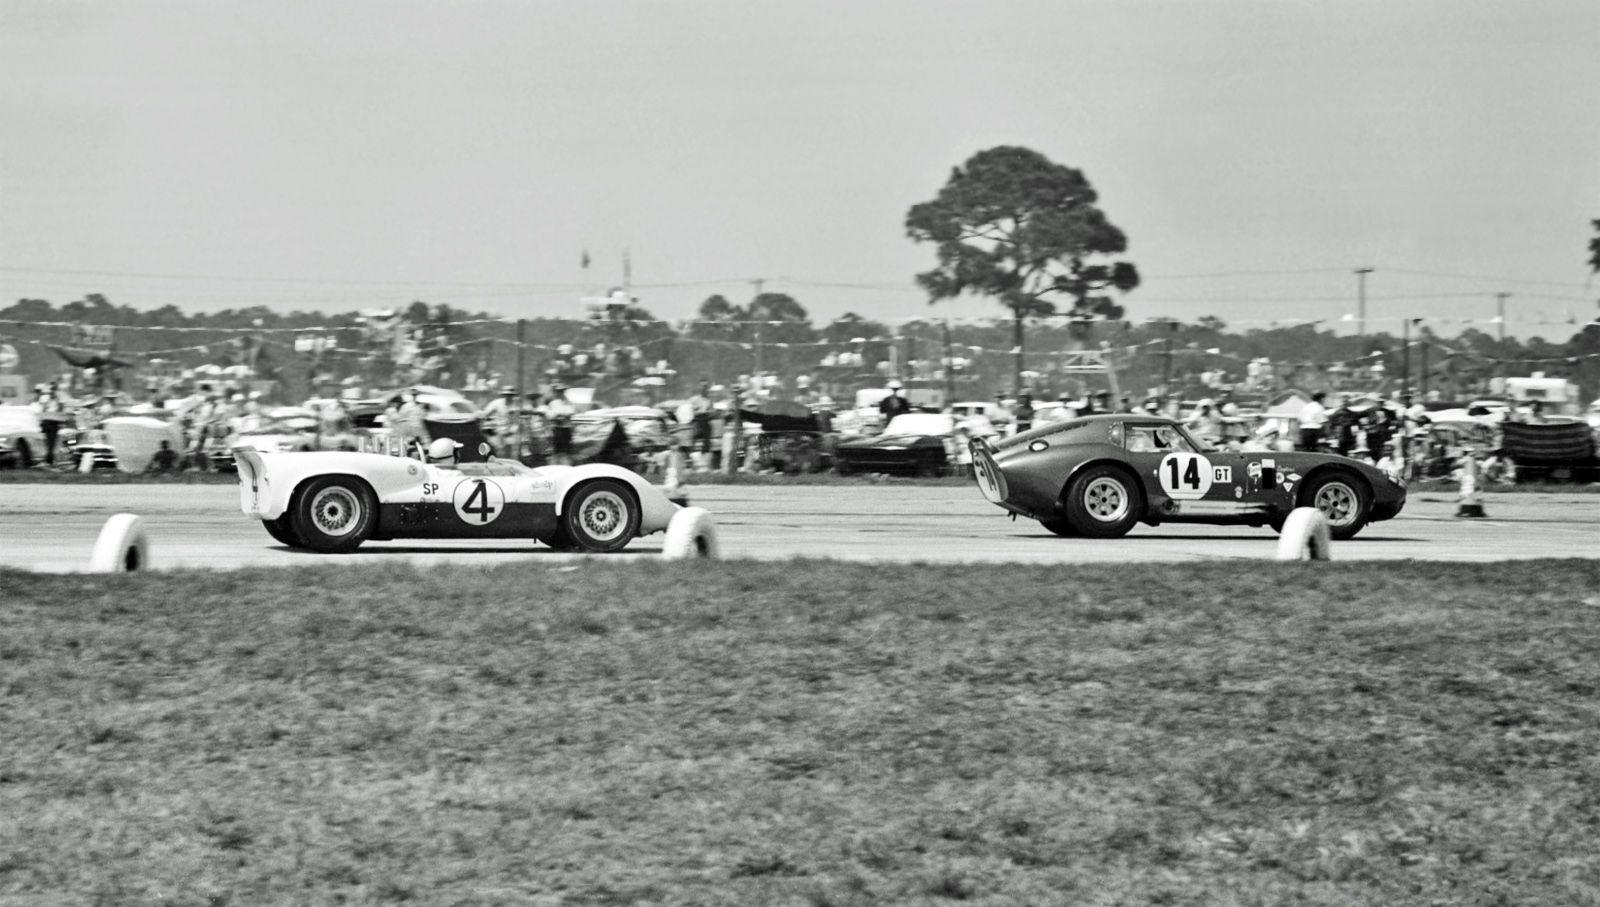 Al Bochroch captures a Shelby Cobra Daytona Coupe being